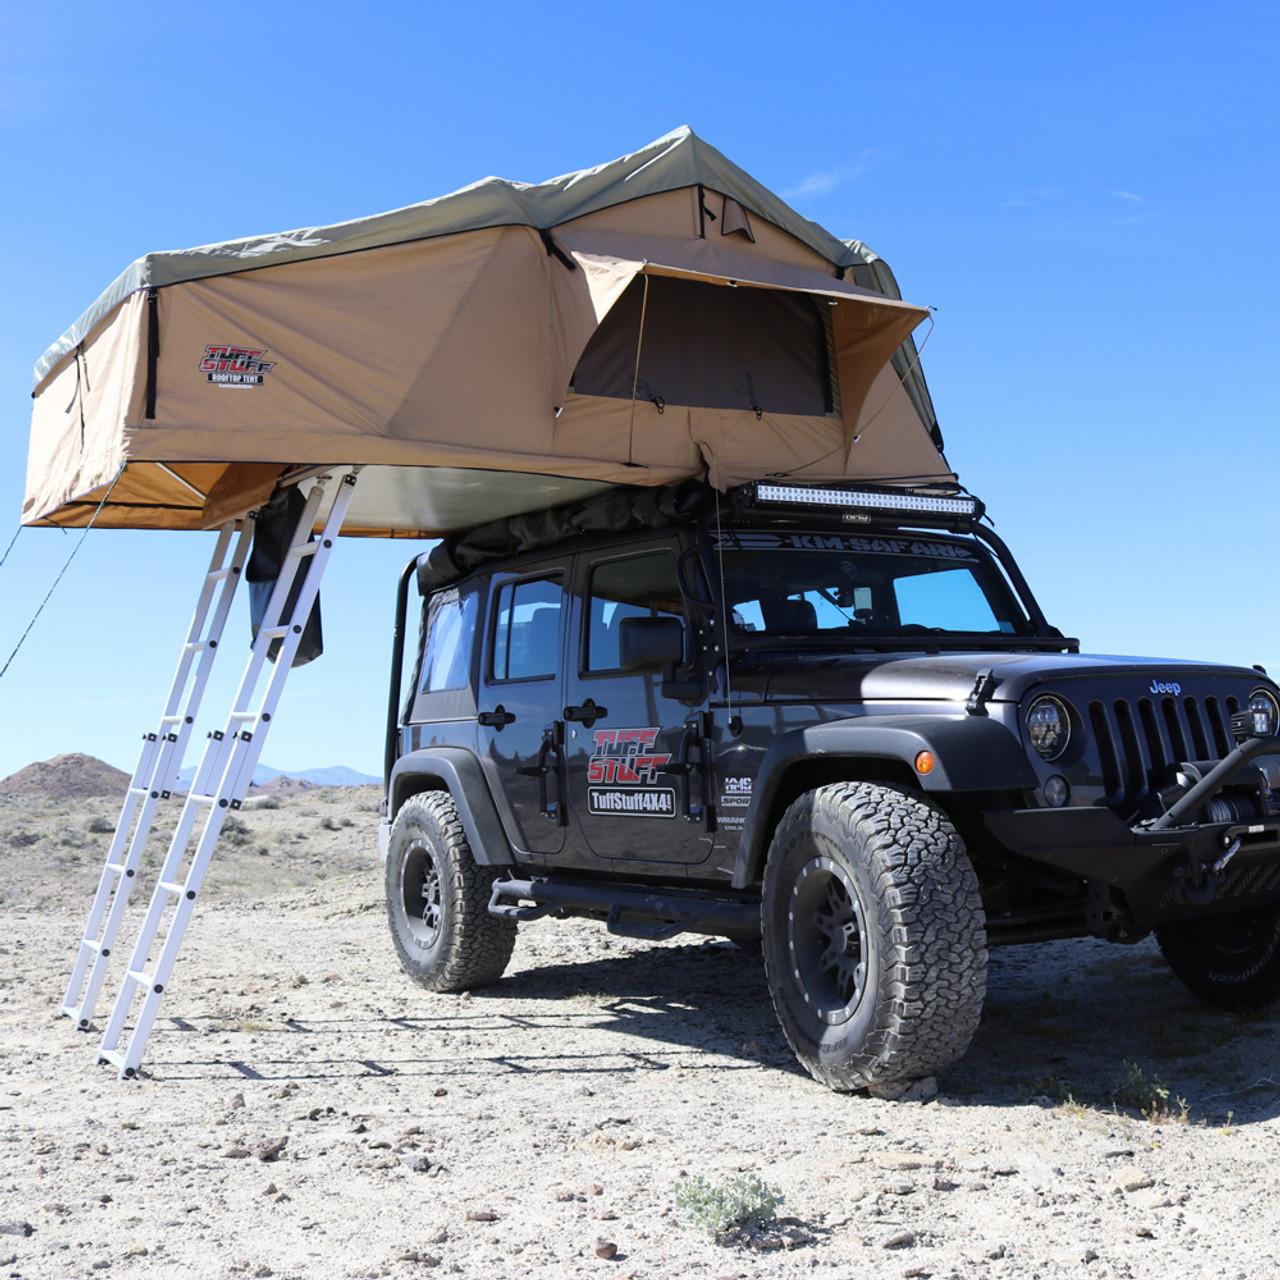 Rooftop Tent Annex Room 5 Person Elite Overland Tuff Stuff Overland Jeephut Offroad